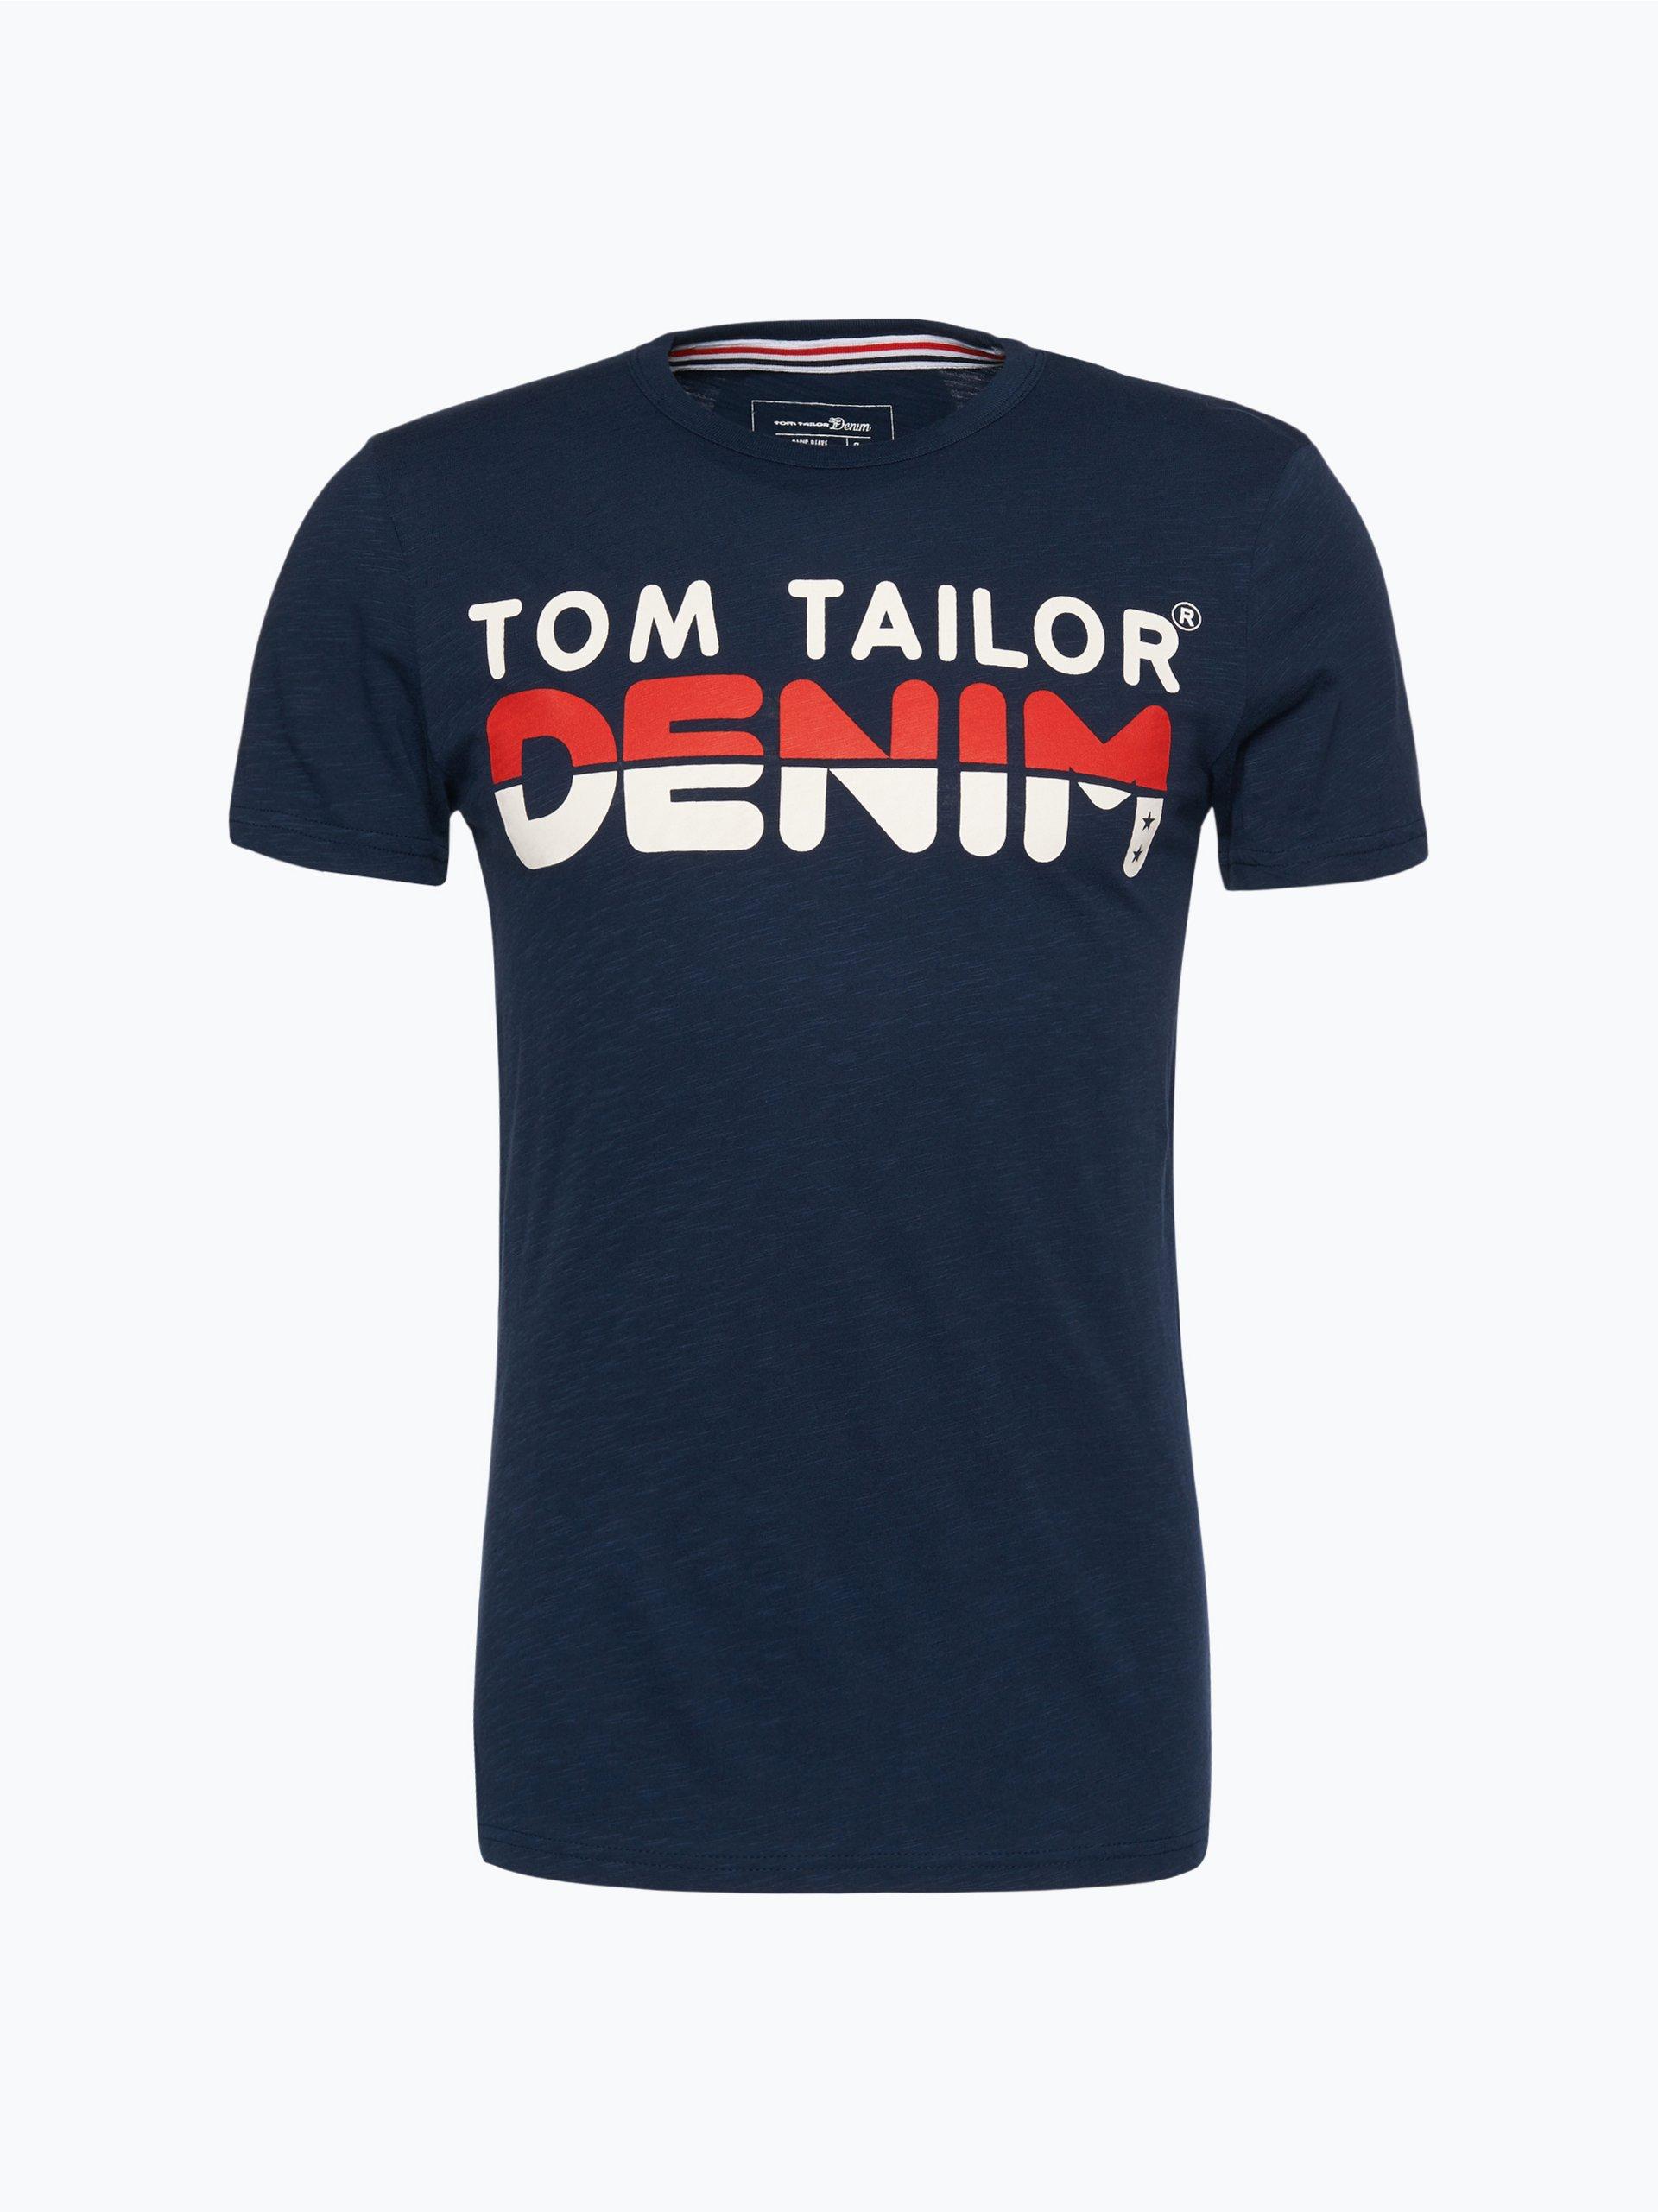 tom tailor denim herren t shirt marine gemustert online. Black Bedroom Furniture Sets. Home Design Ideas